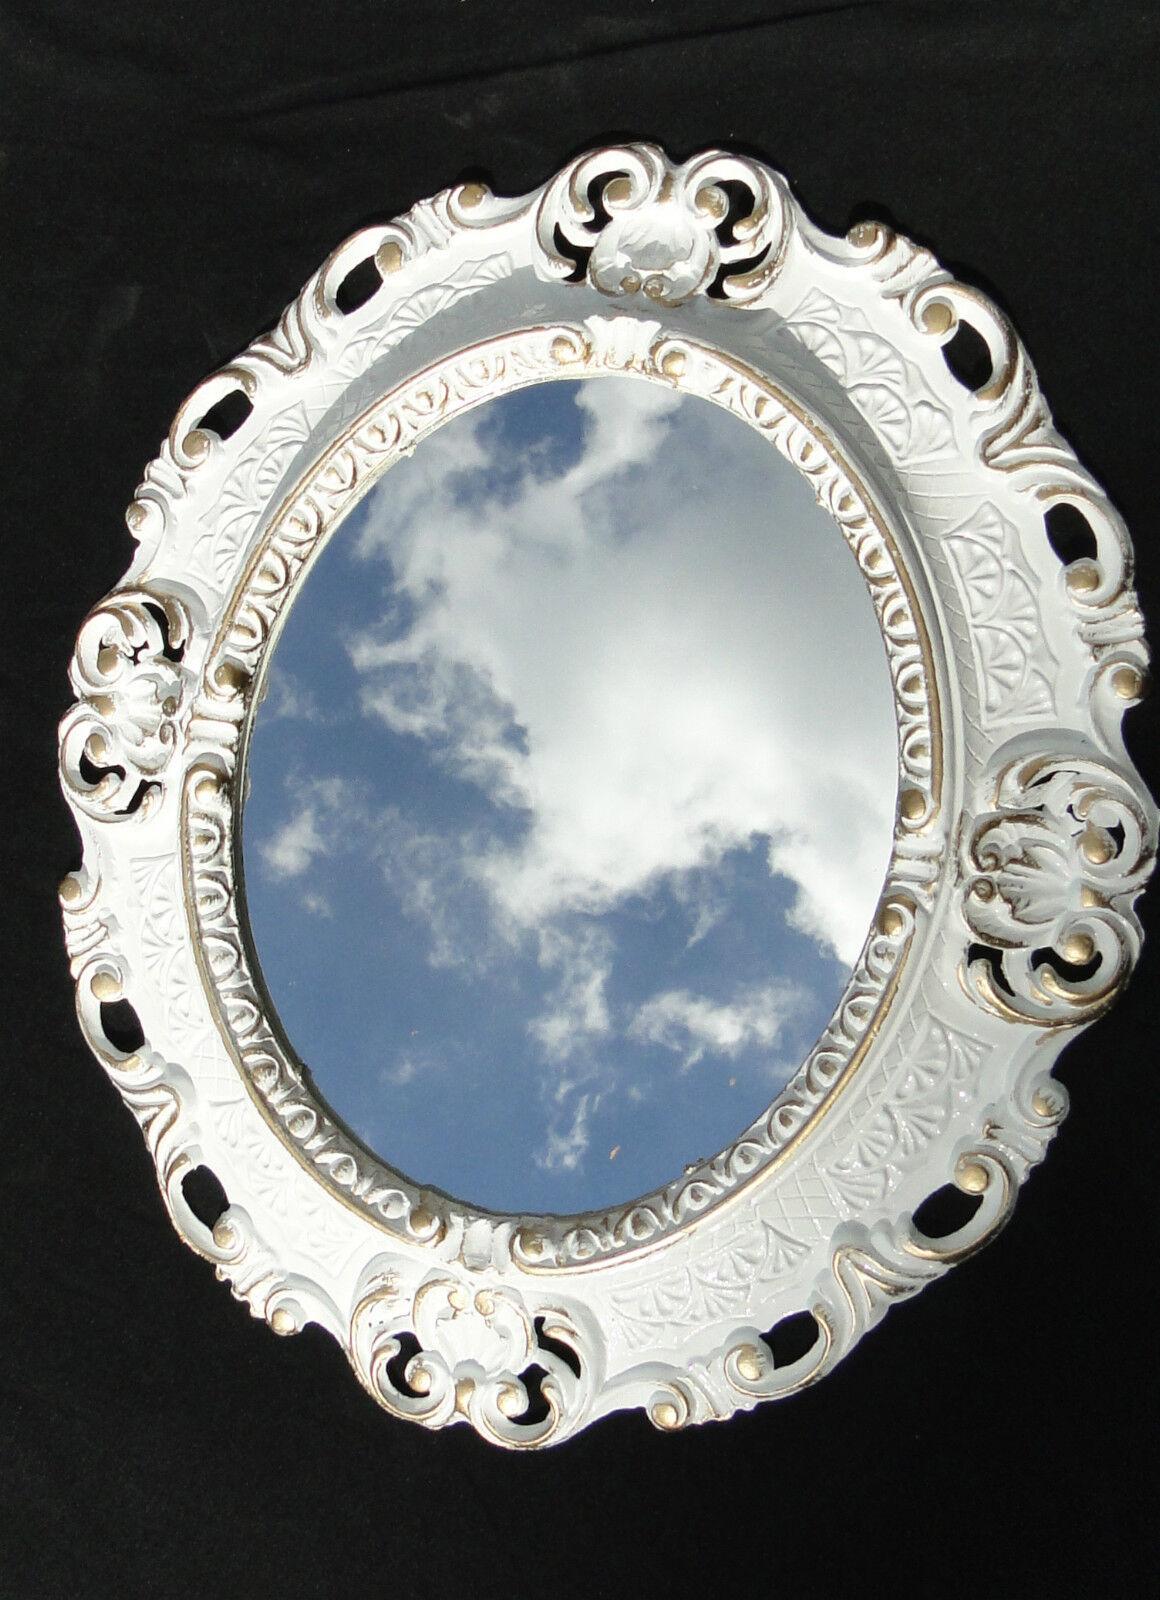 Wandspiegel shabby wei silber oval landhaus antik badspiegel barock 45x37 neu ebay - Spiegel oval silber ...